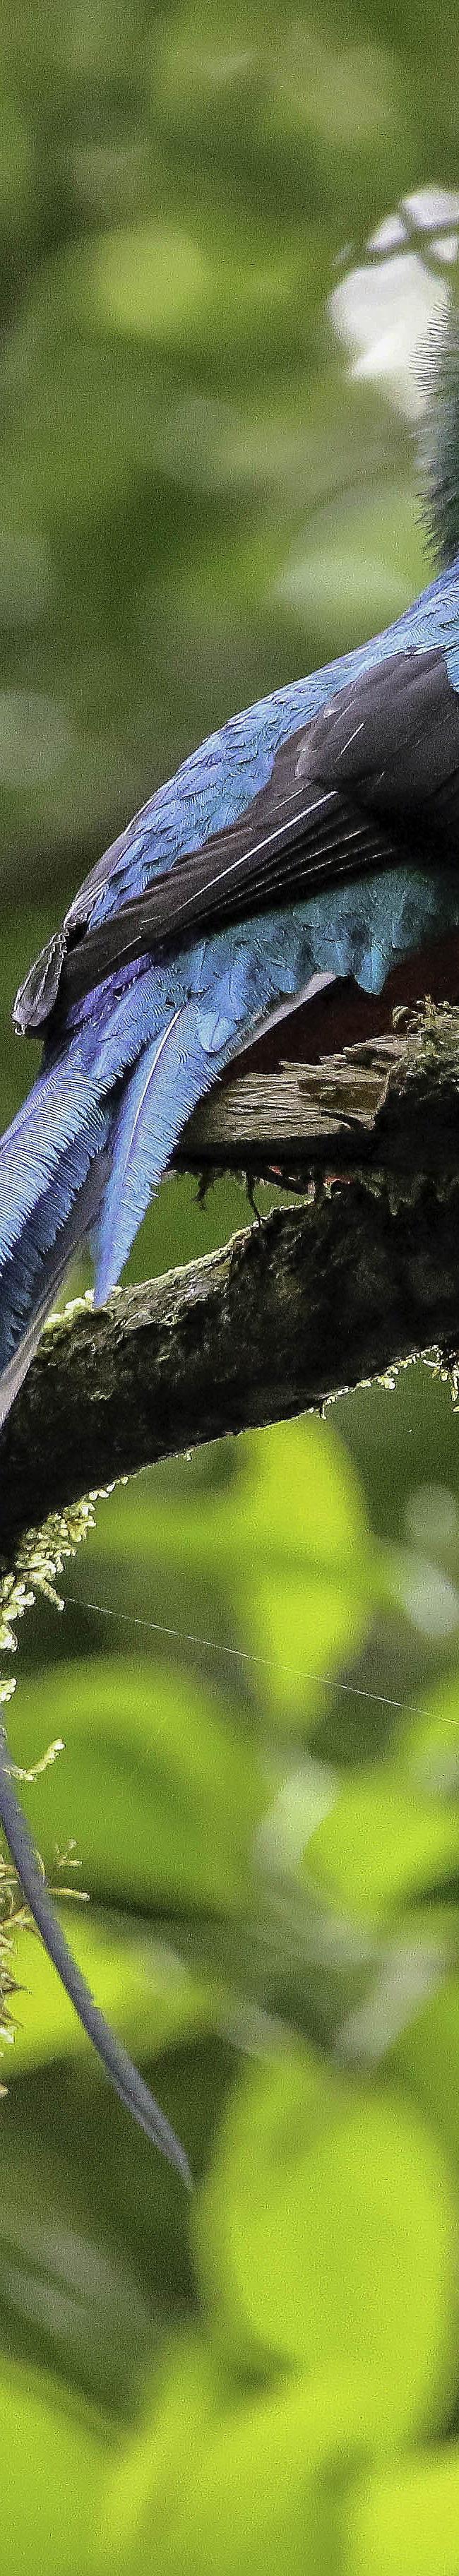 Quetzal (Pharomachrus mocinno) Male